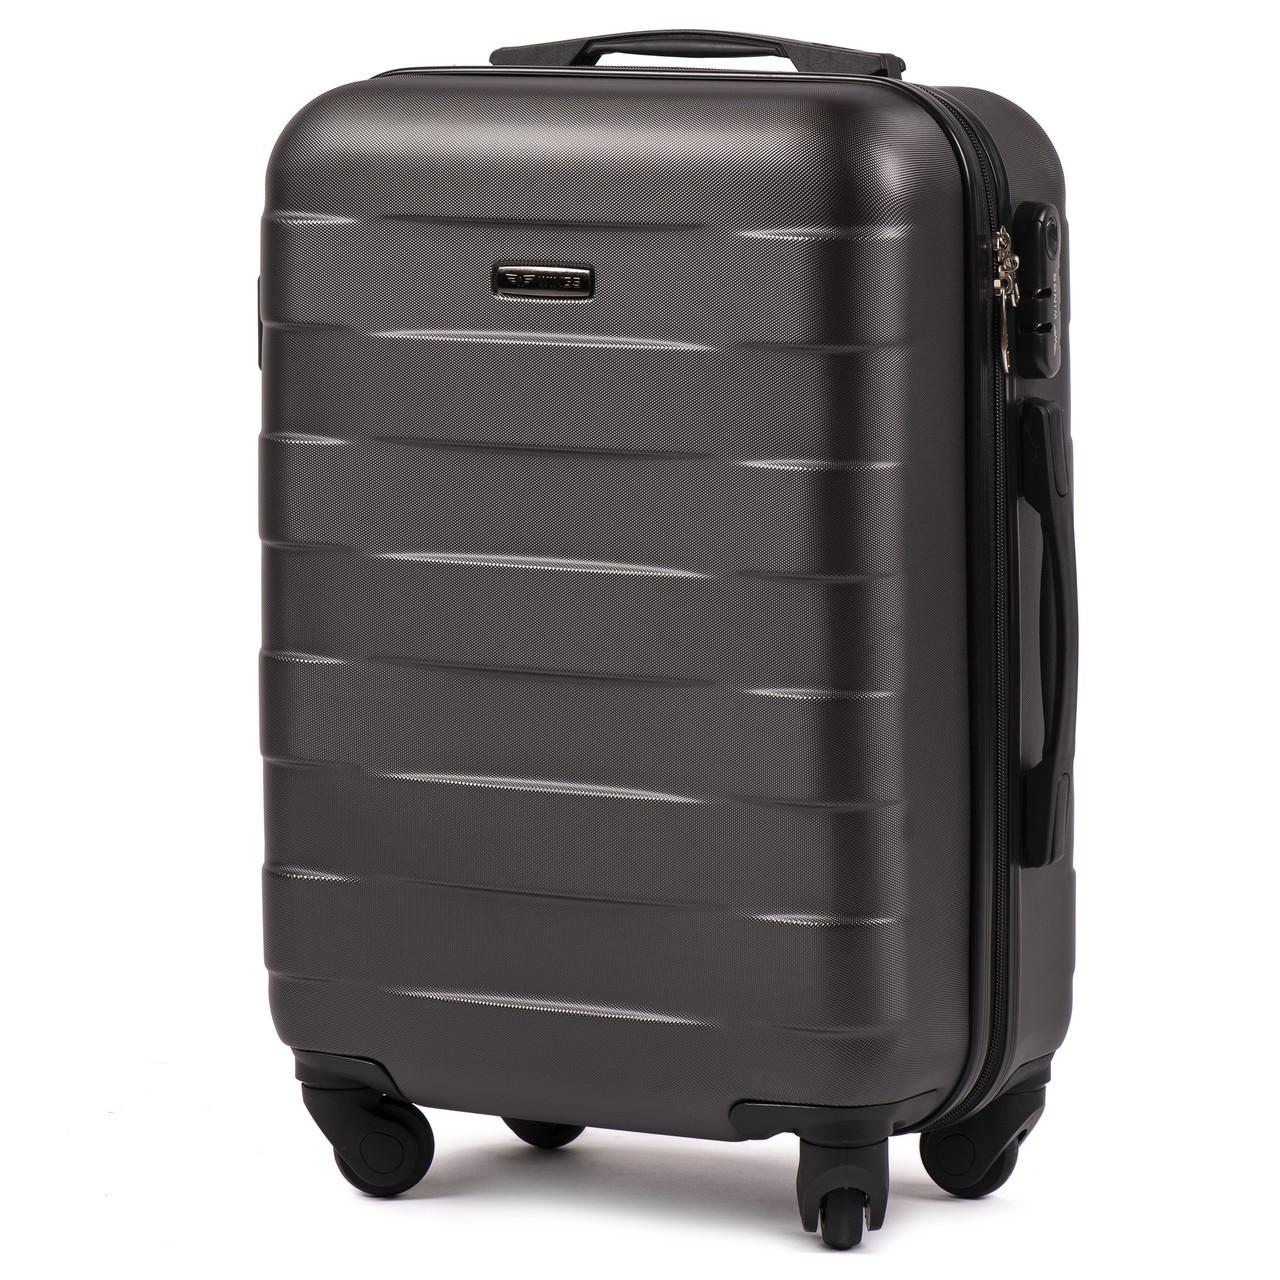 Малый пластиковый чемодан Wings 401 на 4 колесах серый